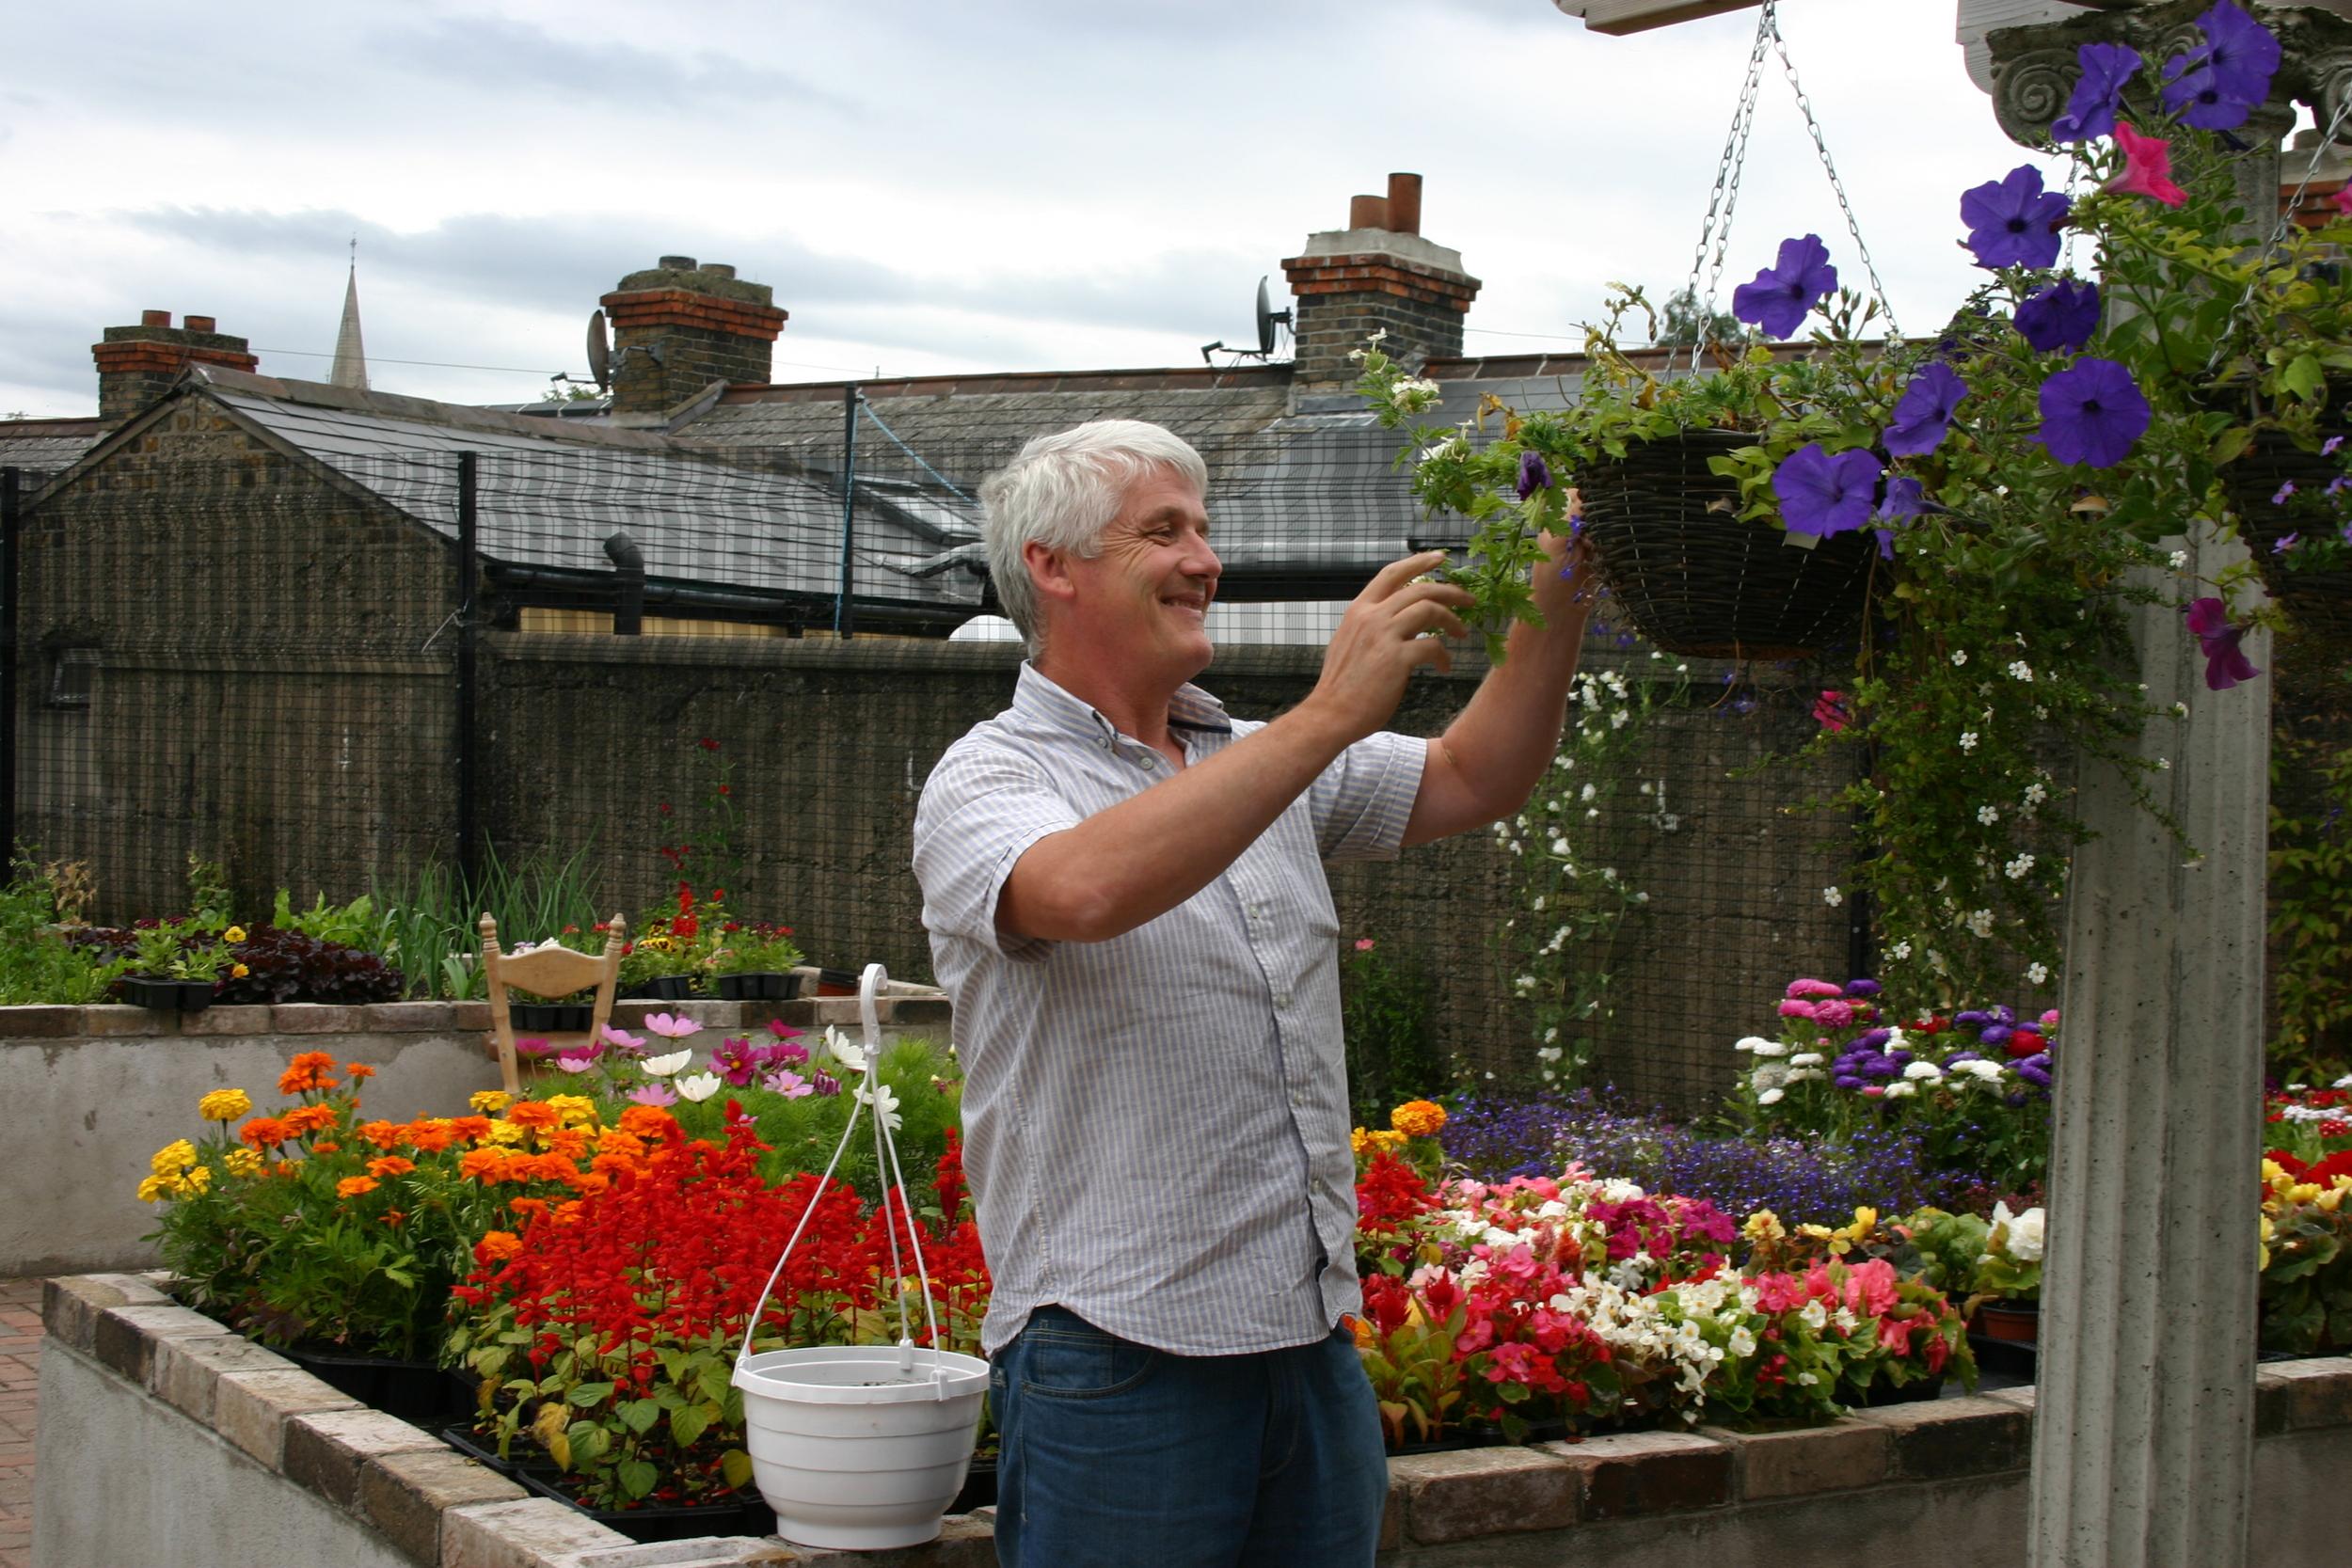 joe working on the plants.jpg